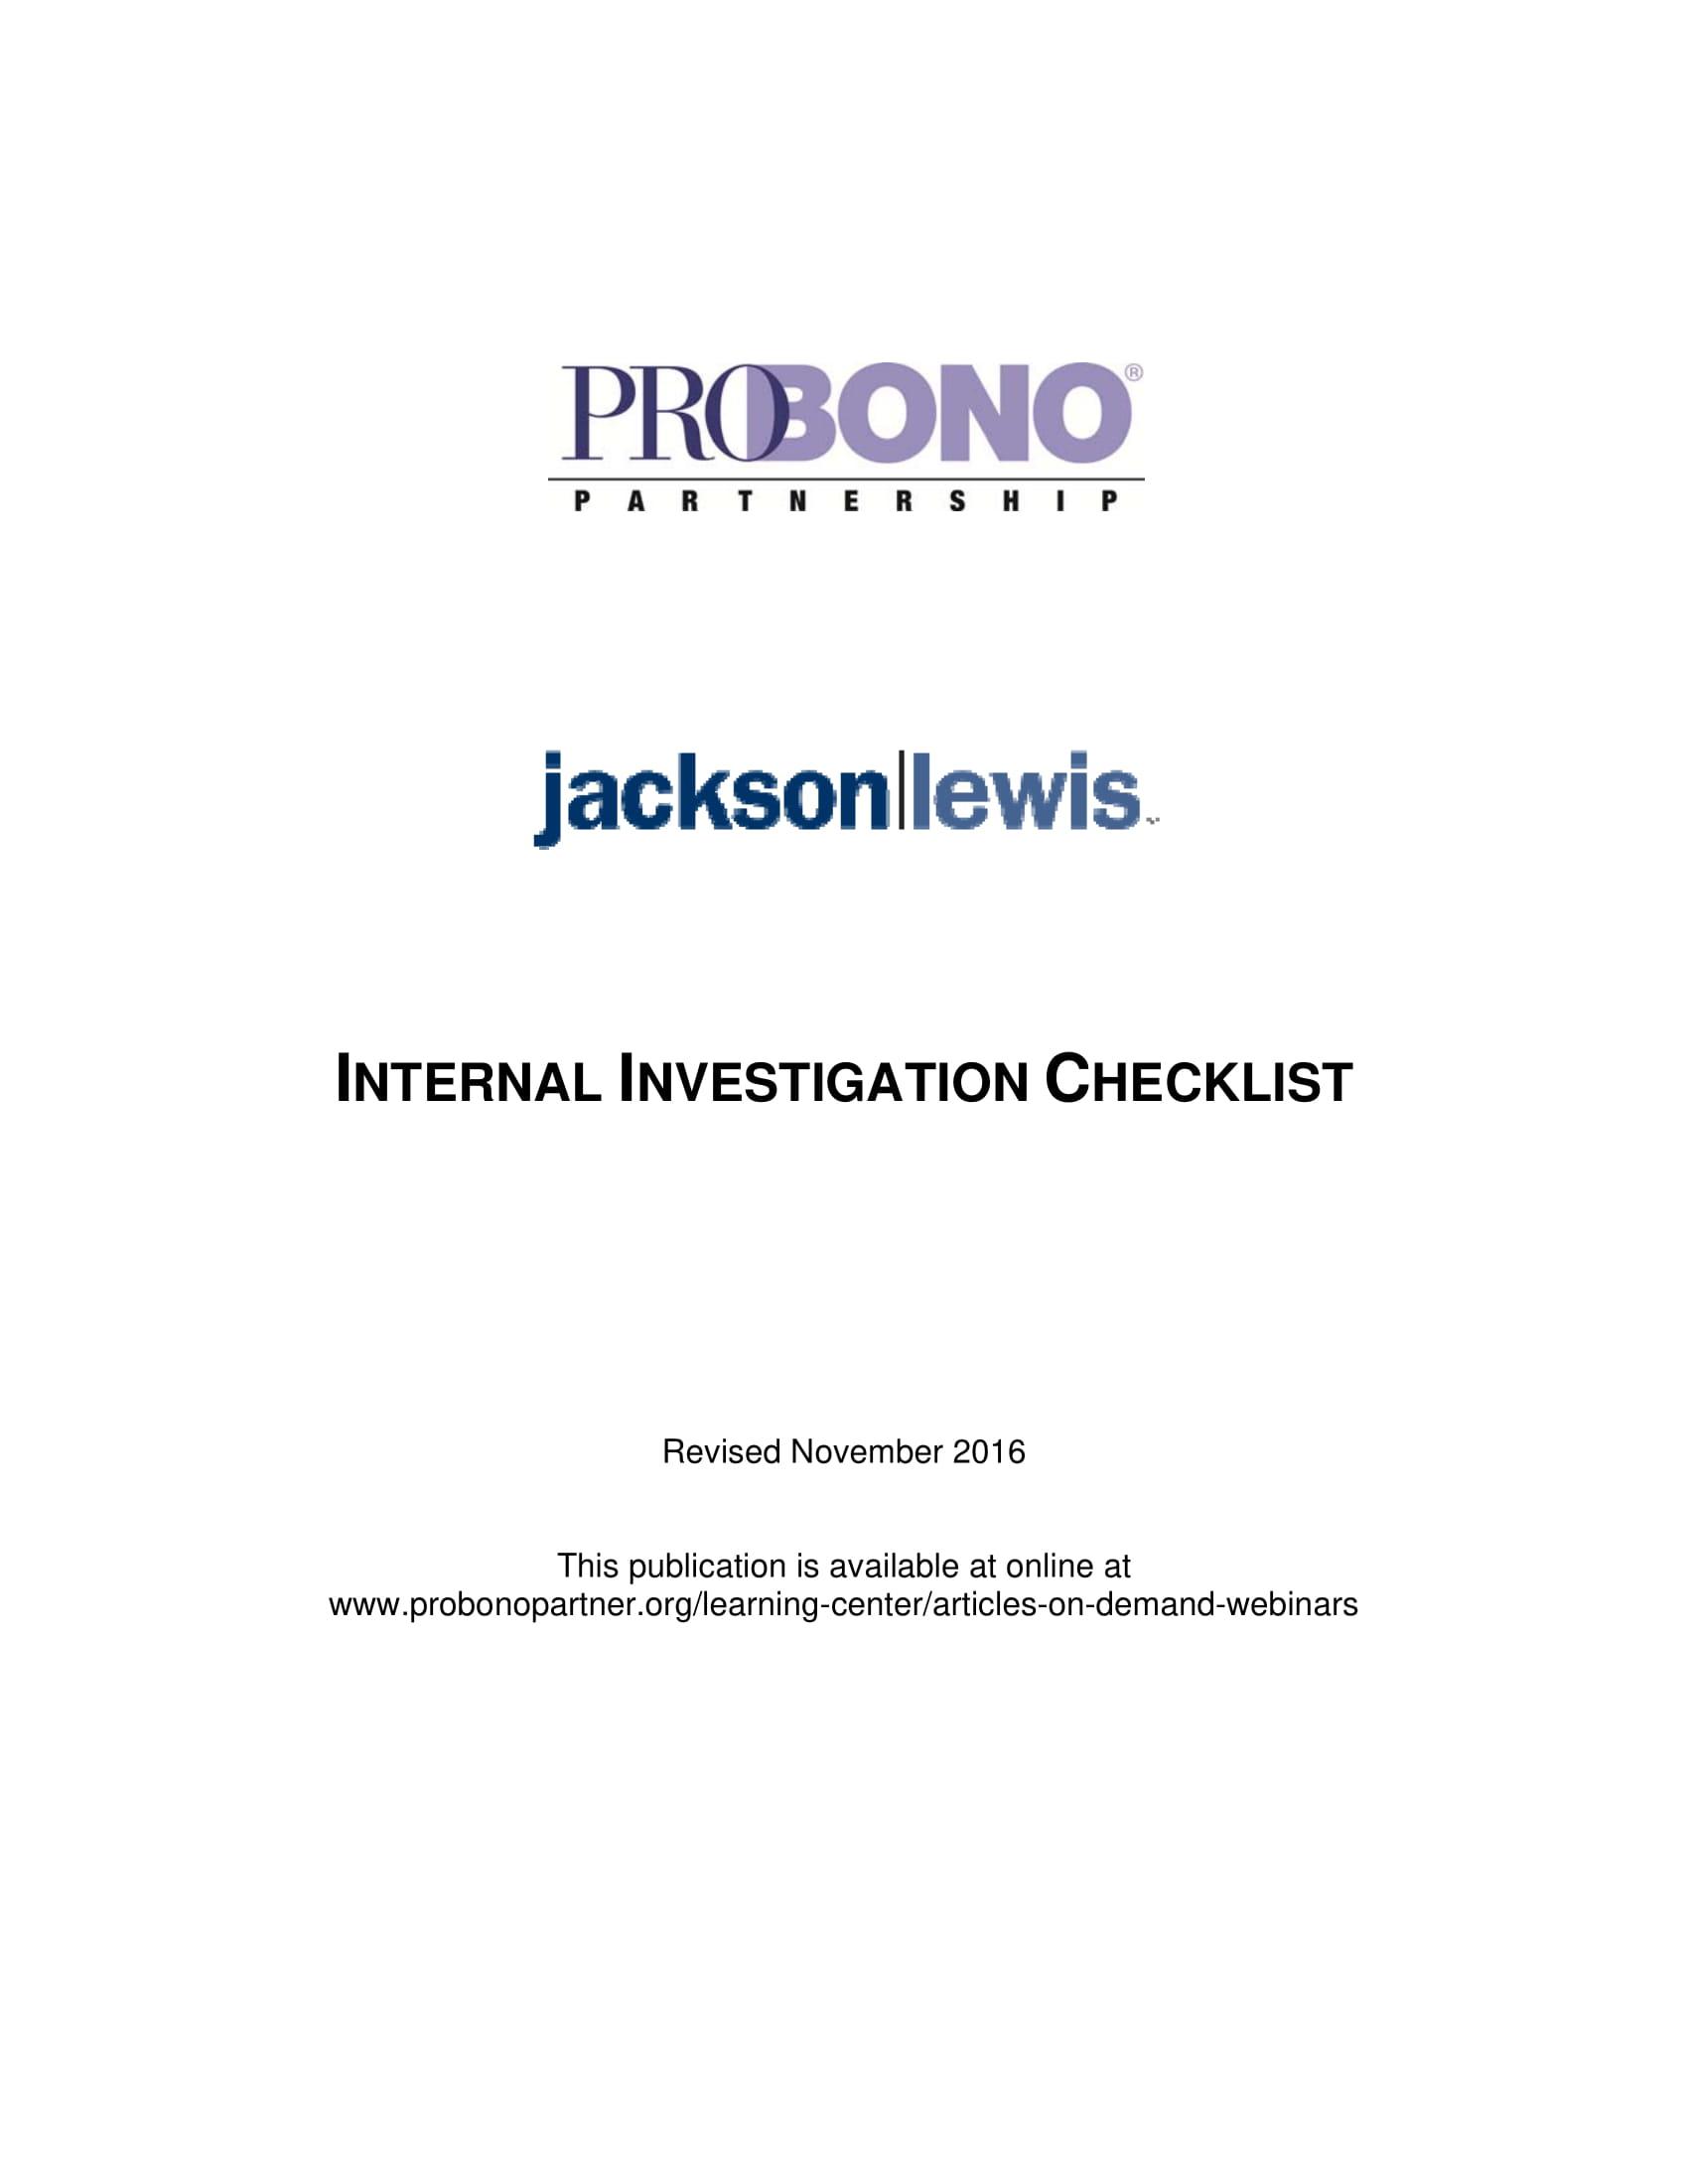 internal investigation of harassment report checklist